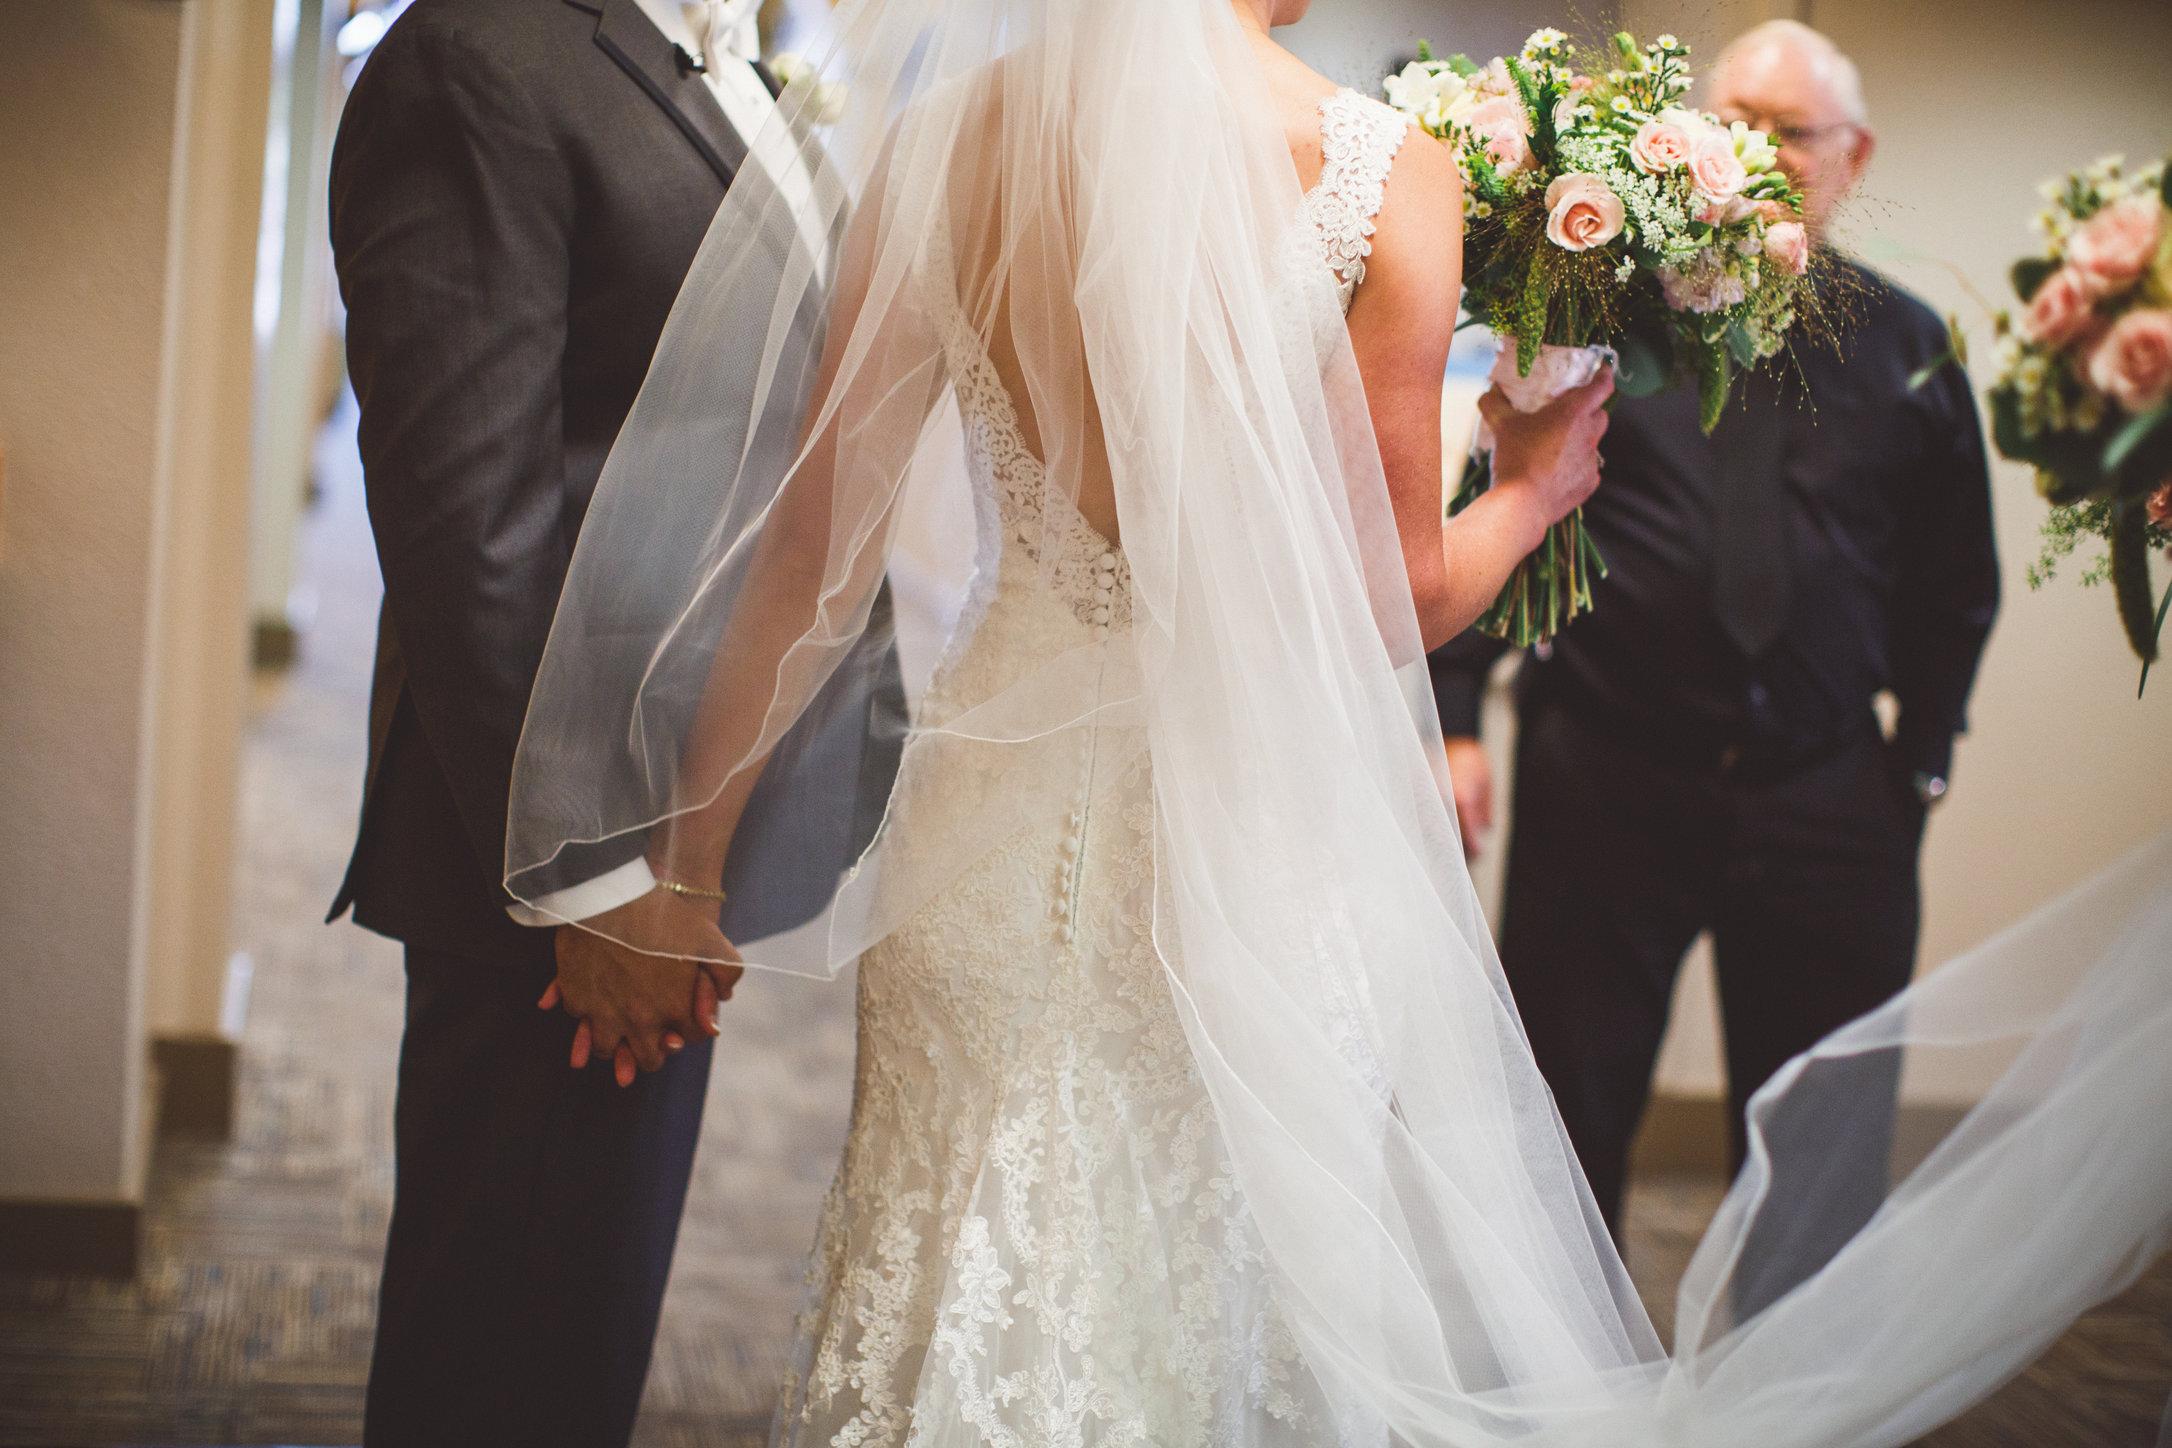 SandC-wedding-235.jpg